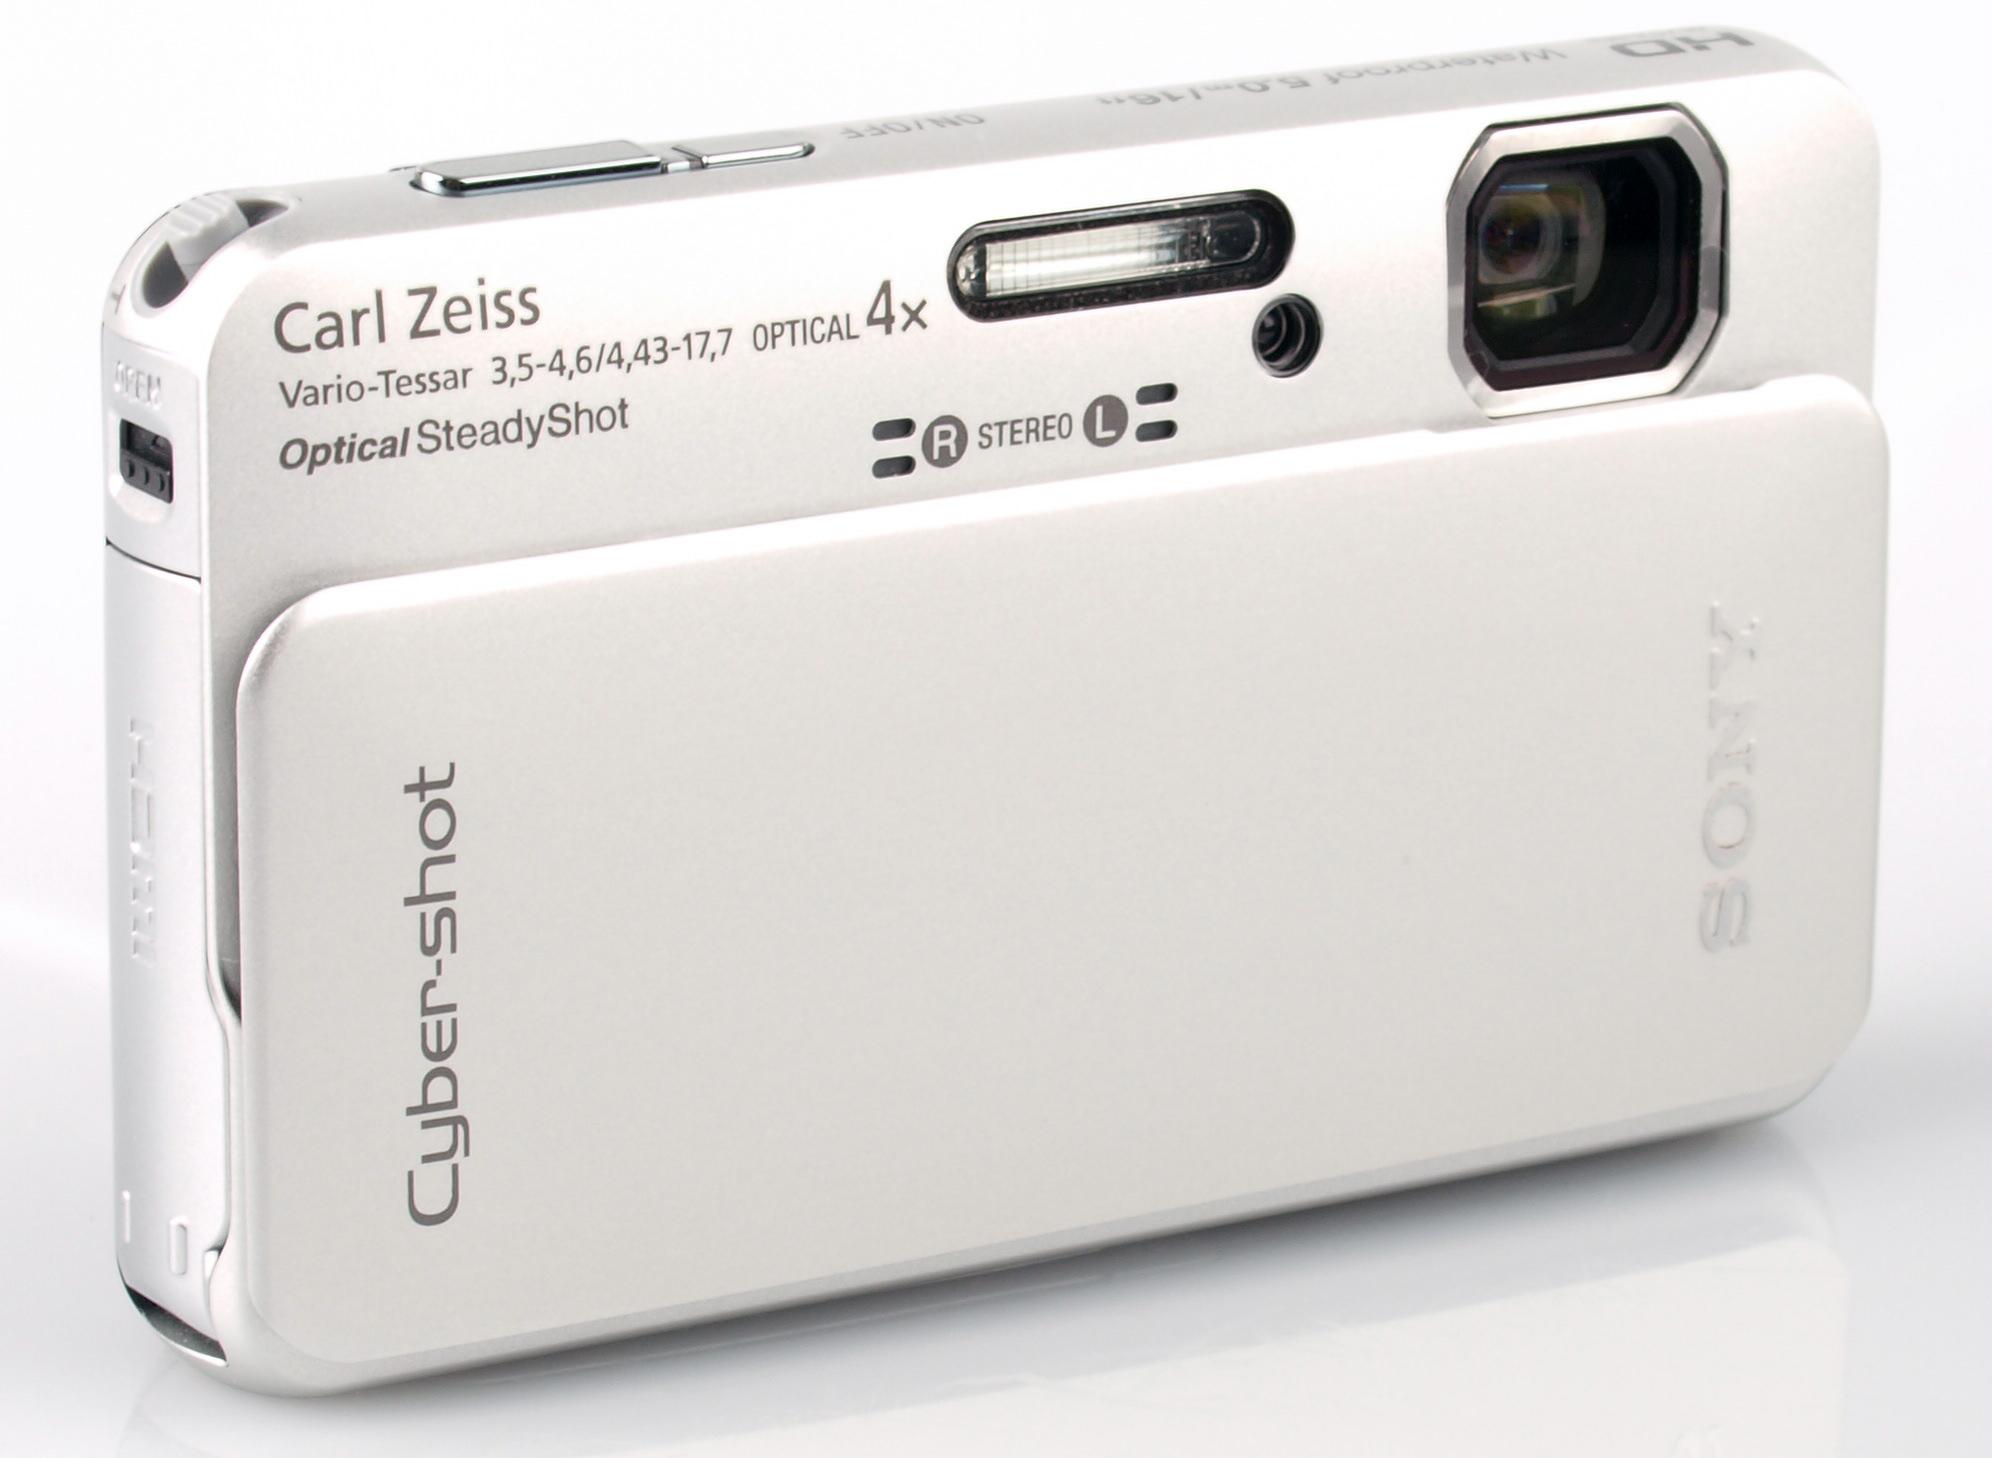 Sony cyber shot dsc w80 digital camera resource page -  Sony Cybershot Dsc Tx10 Digital Camera Review